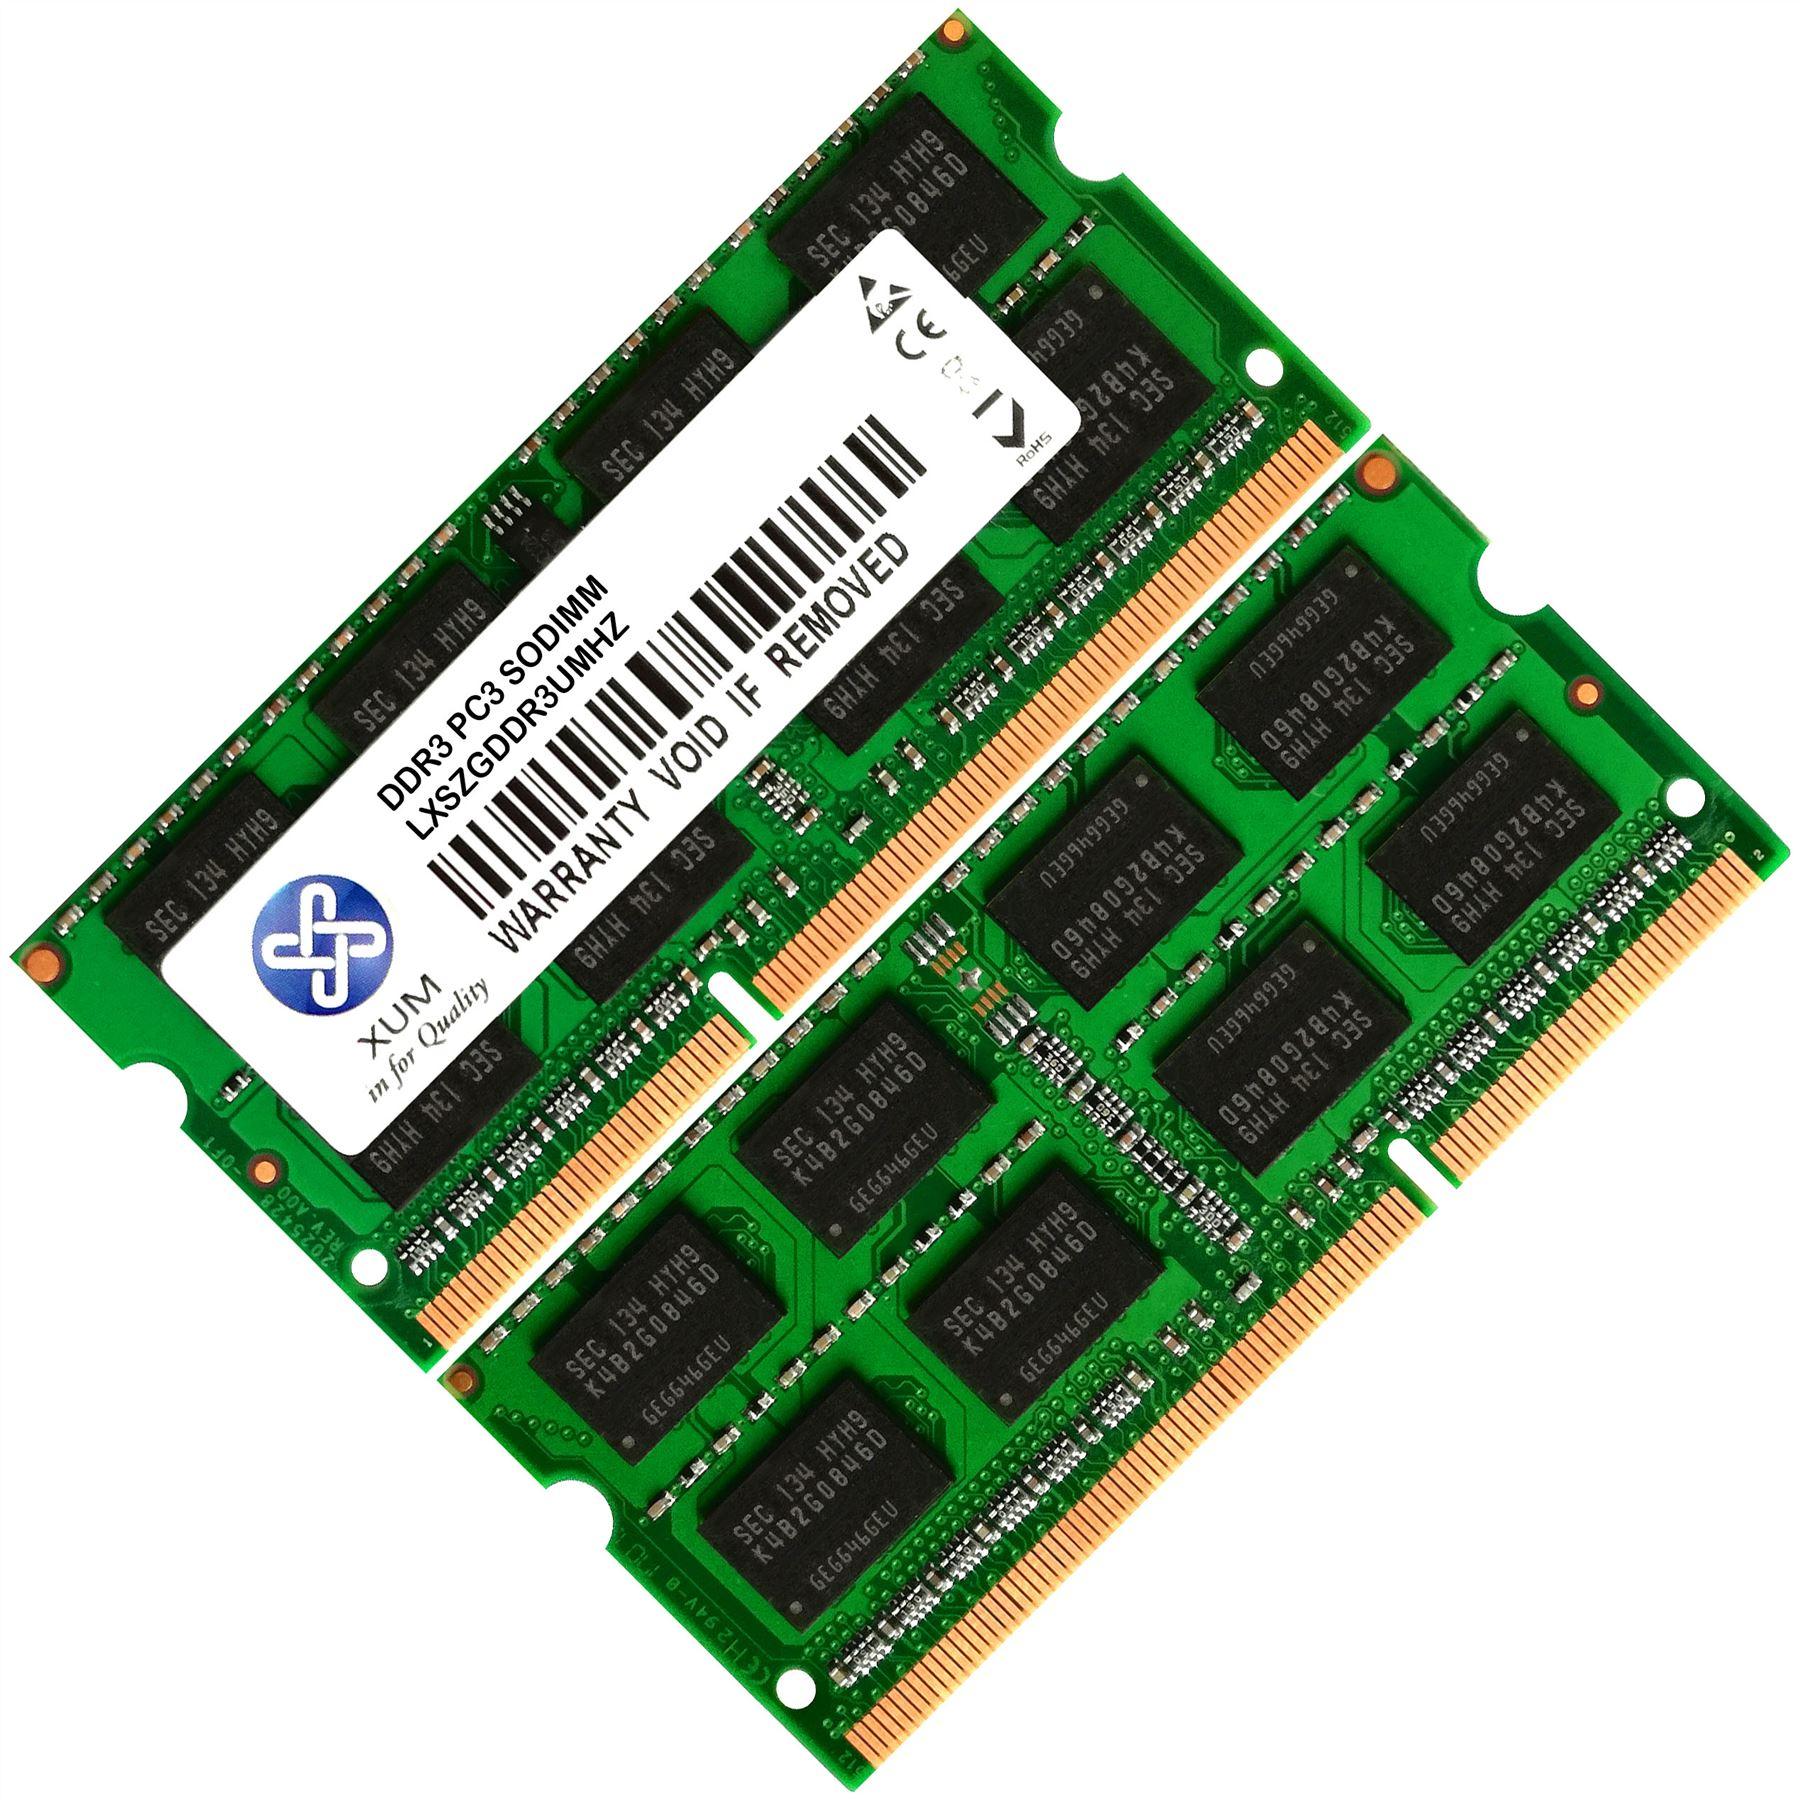 Memoria-Ram-Toshiba-Satellite-Laptop-C50-A-1F1-C50-A-1F5-Nuevo-Lot-DDR3-SDRAM